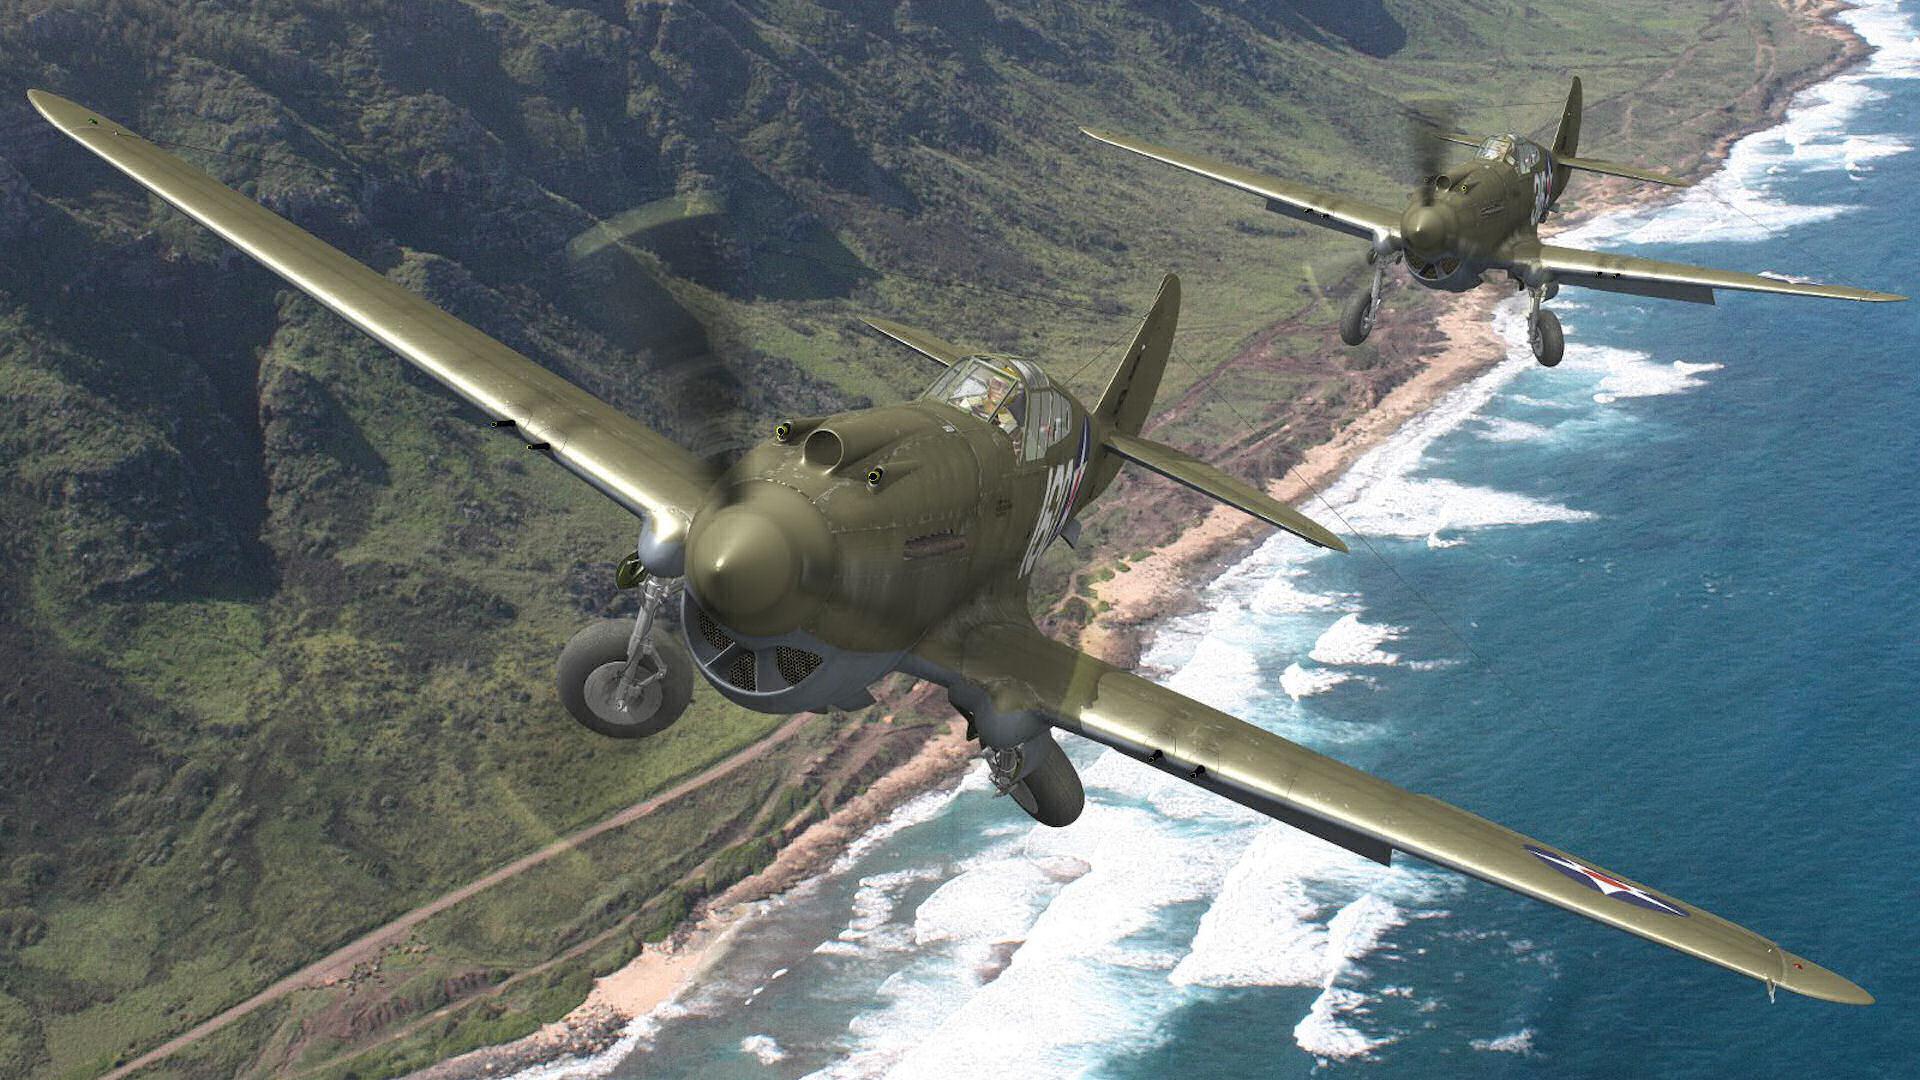 Curtiss P-40 Warhawk wallpapers HD quality